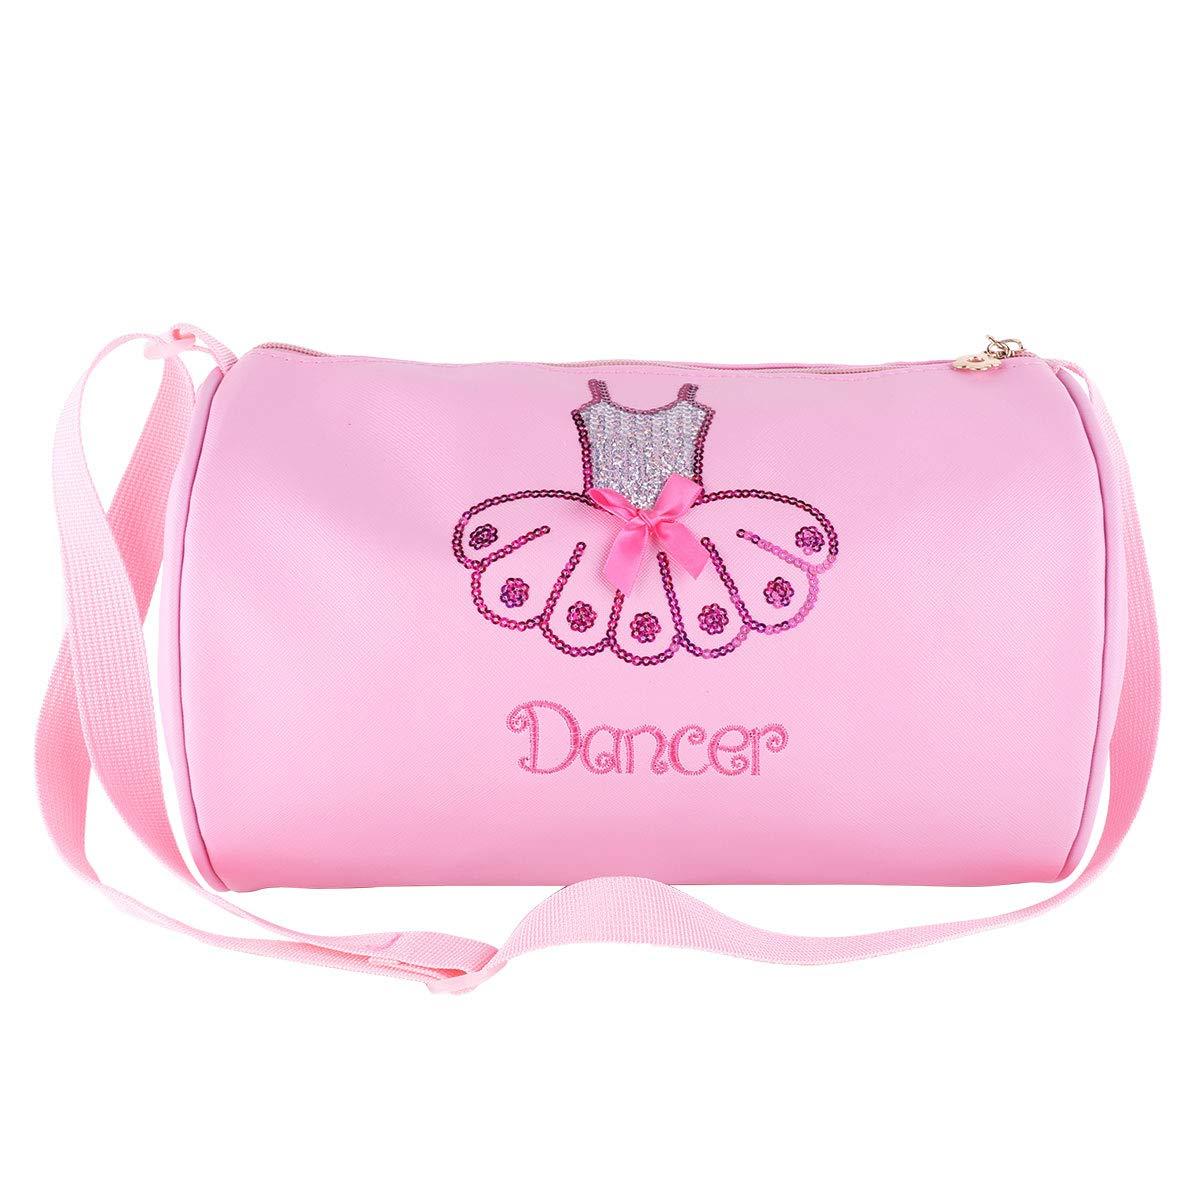 iiniim Ballet Bag Girls Handbag Ballet Dance Shoe Bag Ballerina Bag Kids Embroidery Shoulder Bag Pink One Size